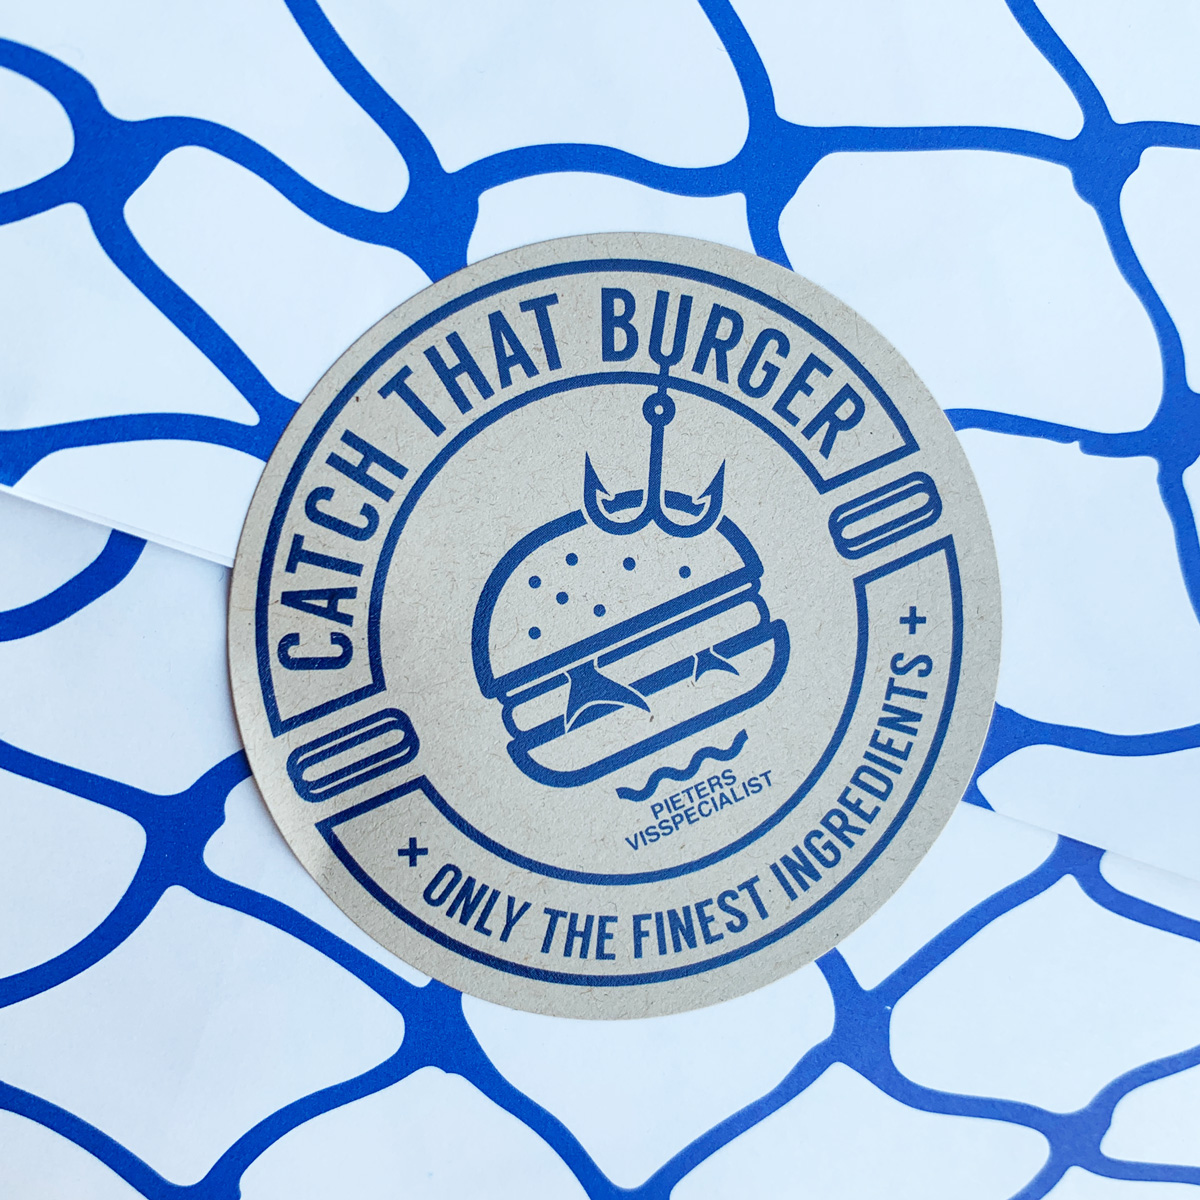 Logo van Catch That Burger